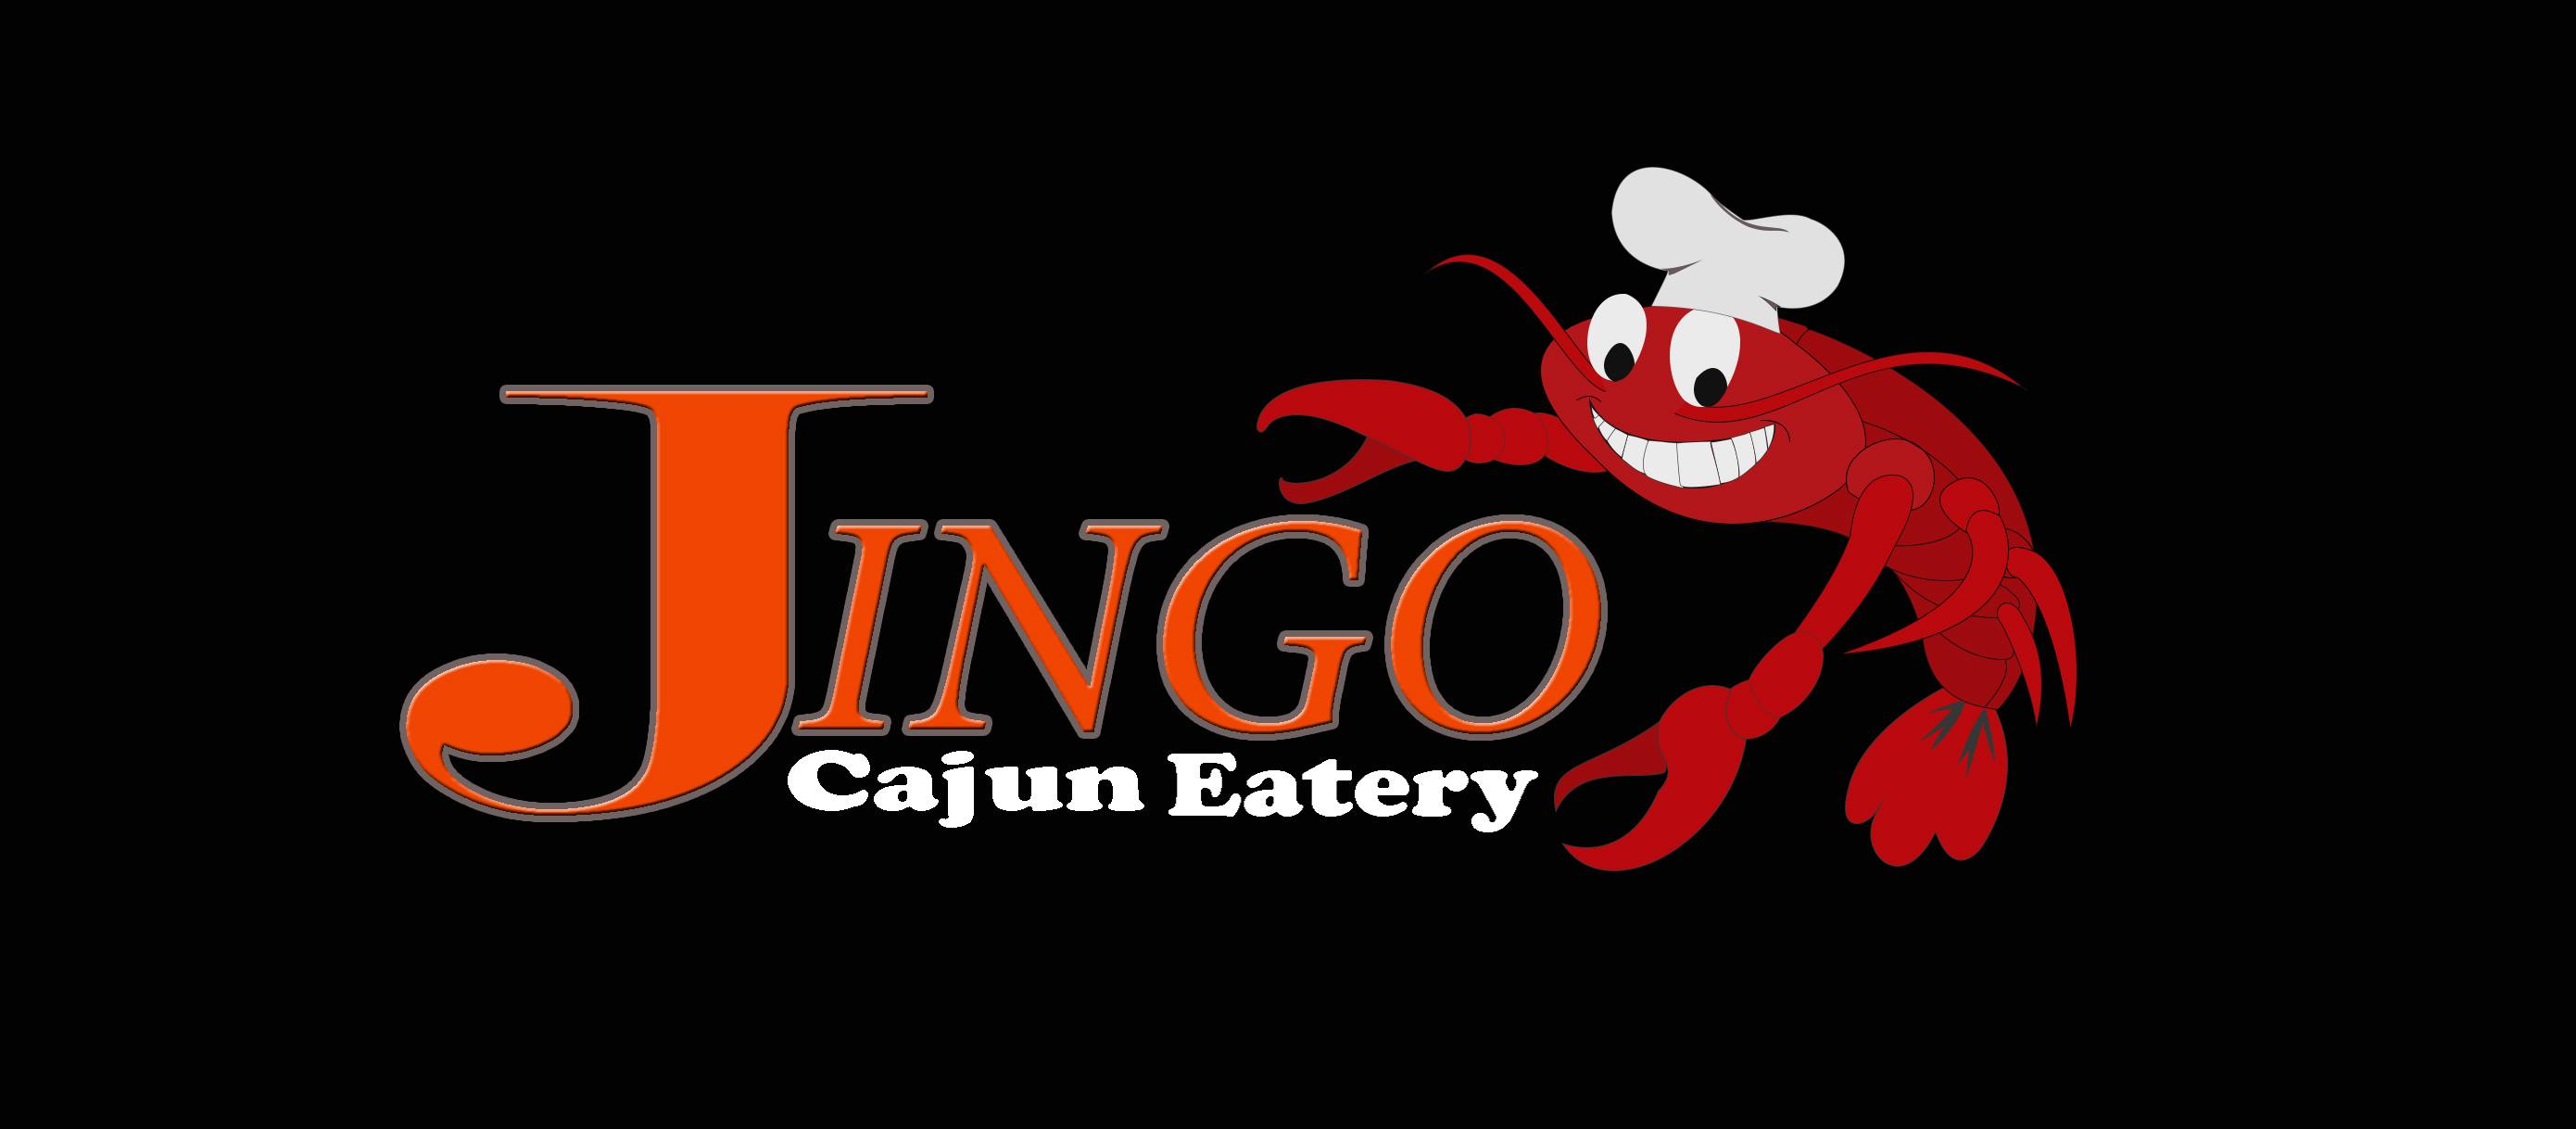 Jingo Cajun Eatery